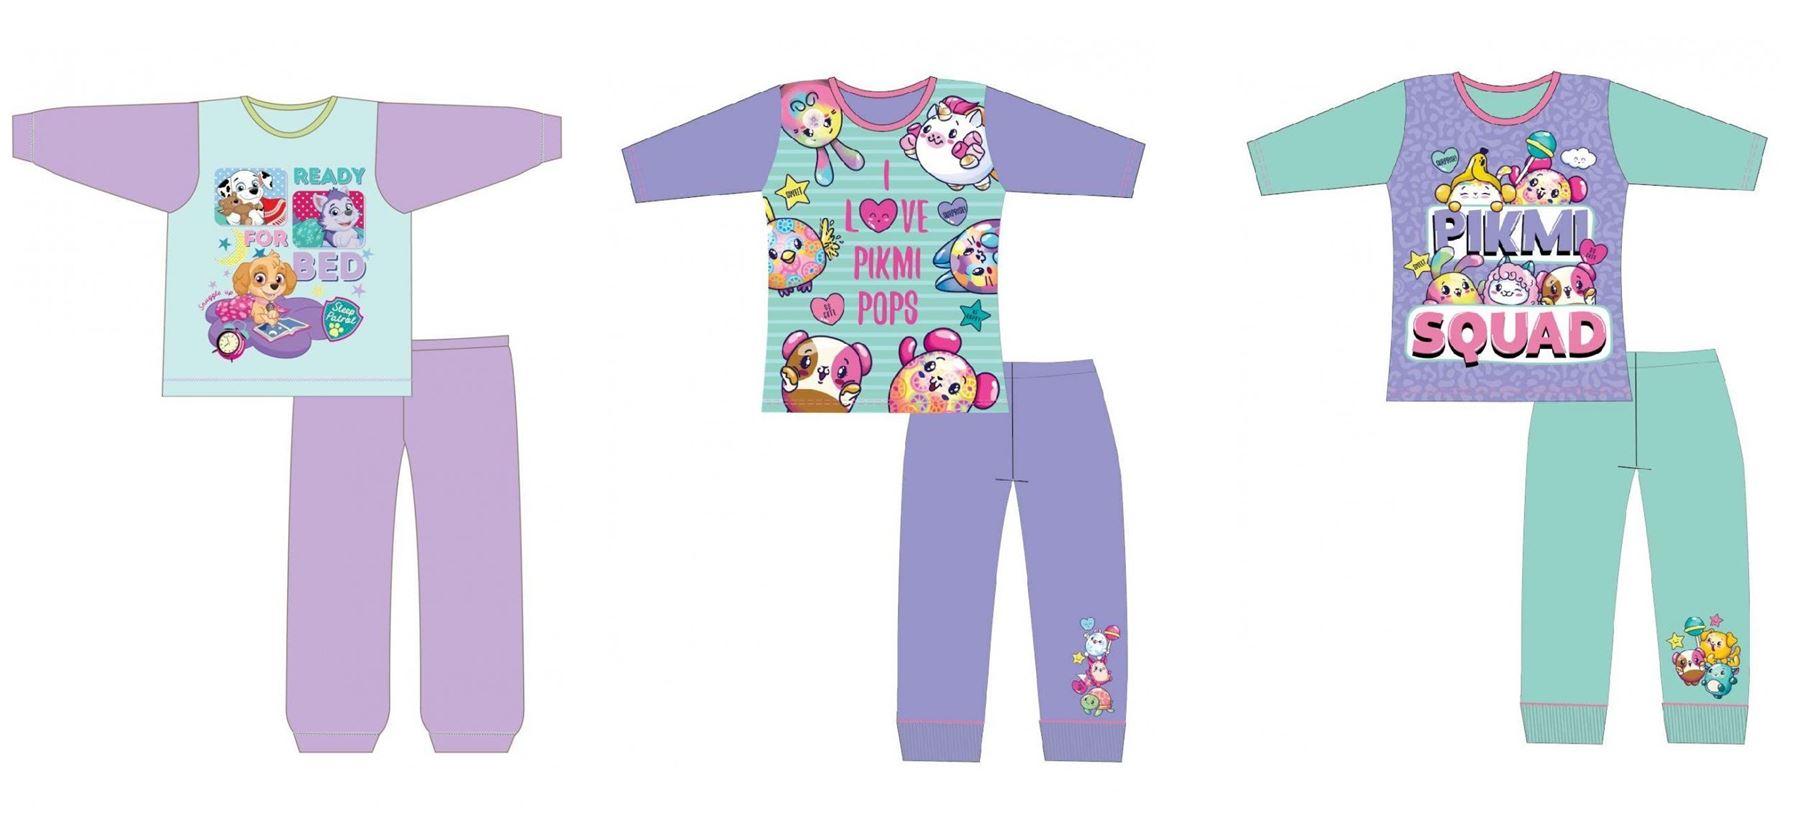 5d7304539 Details about Girls Nightwear Character Pyjama Set Kids Pj Gift